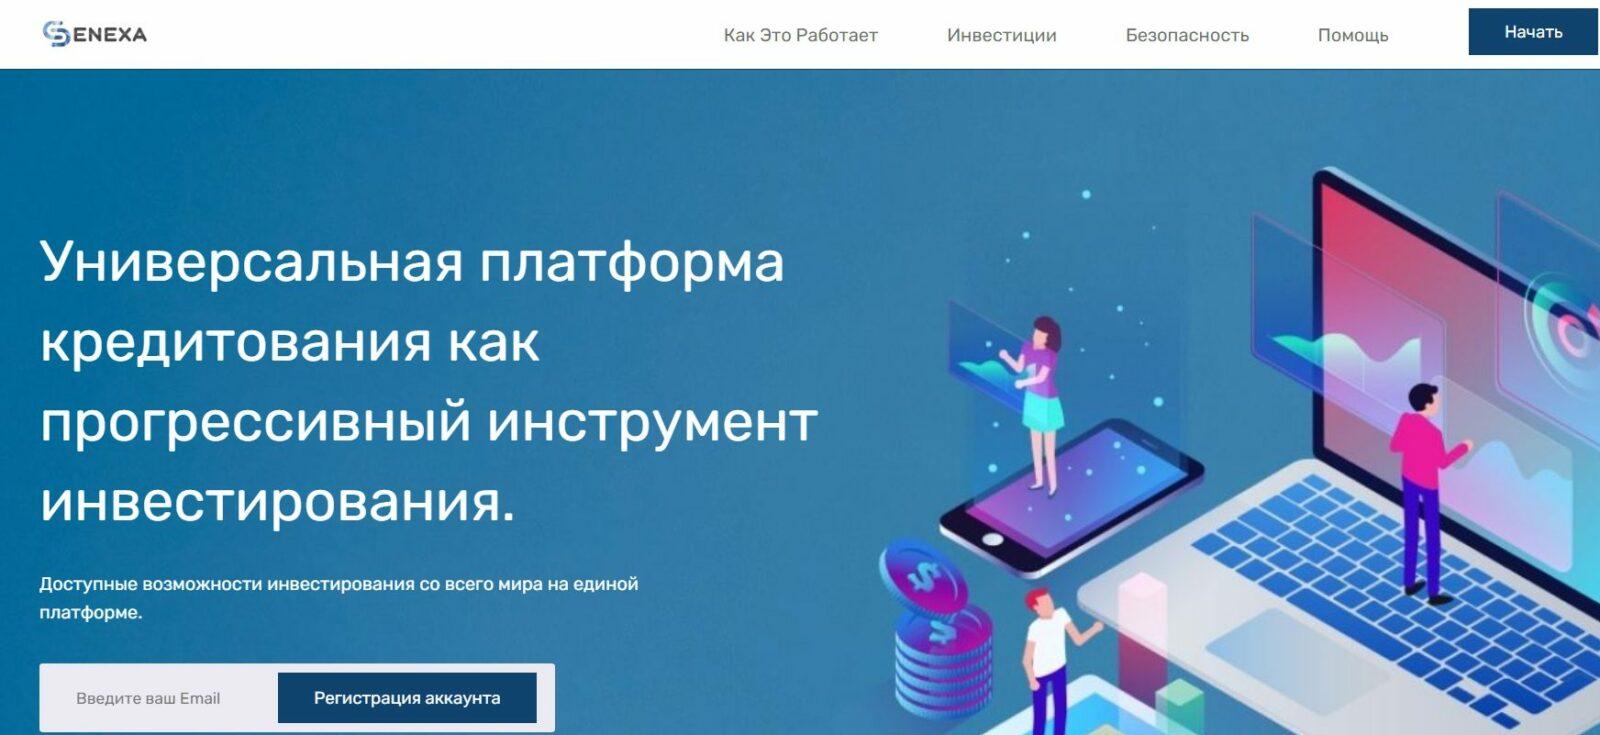 Seneca Инвестиции - финансовая платформа